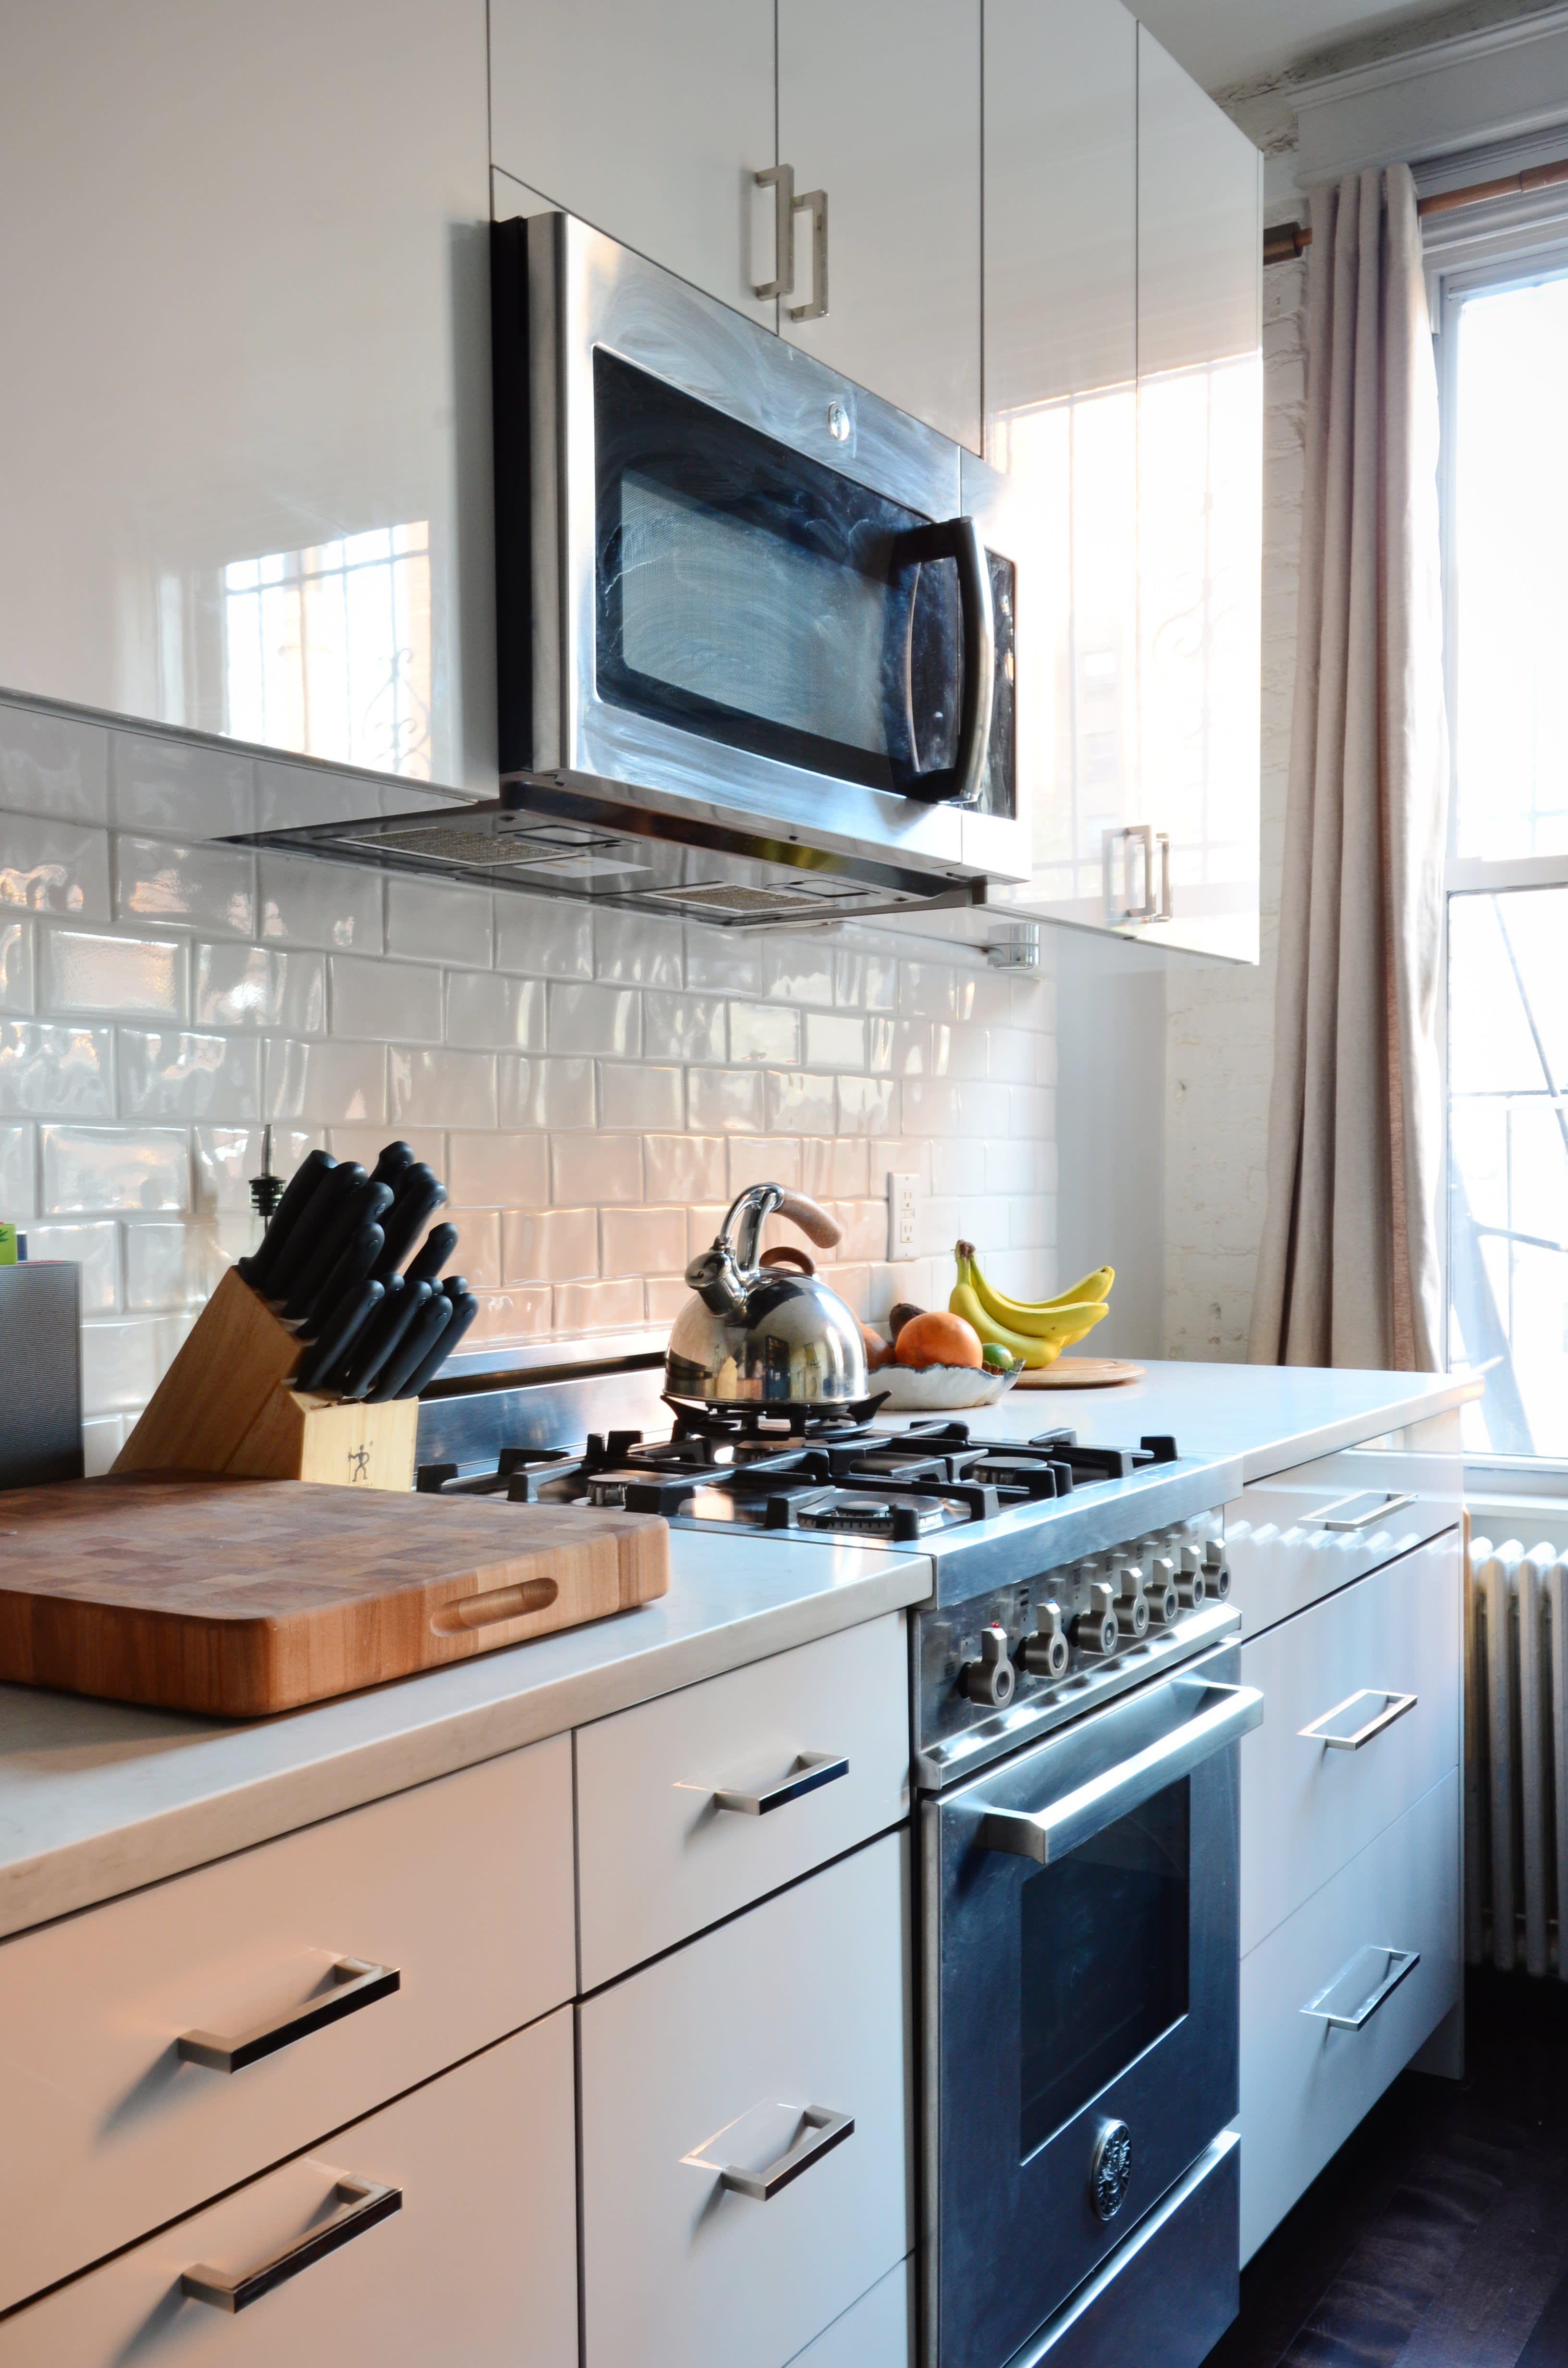 Best Small Kitchen Renovations: Best Small Kitchen Design Ideas